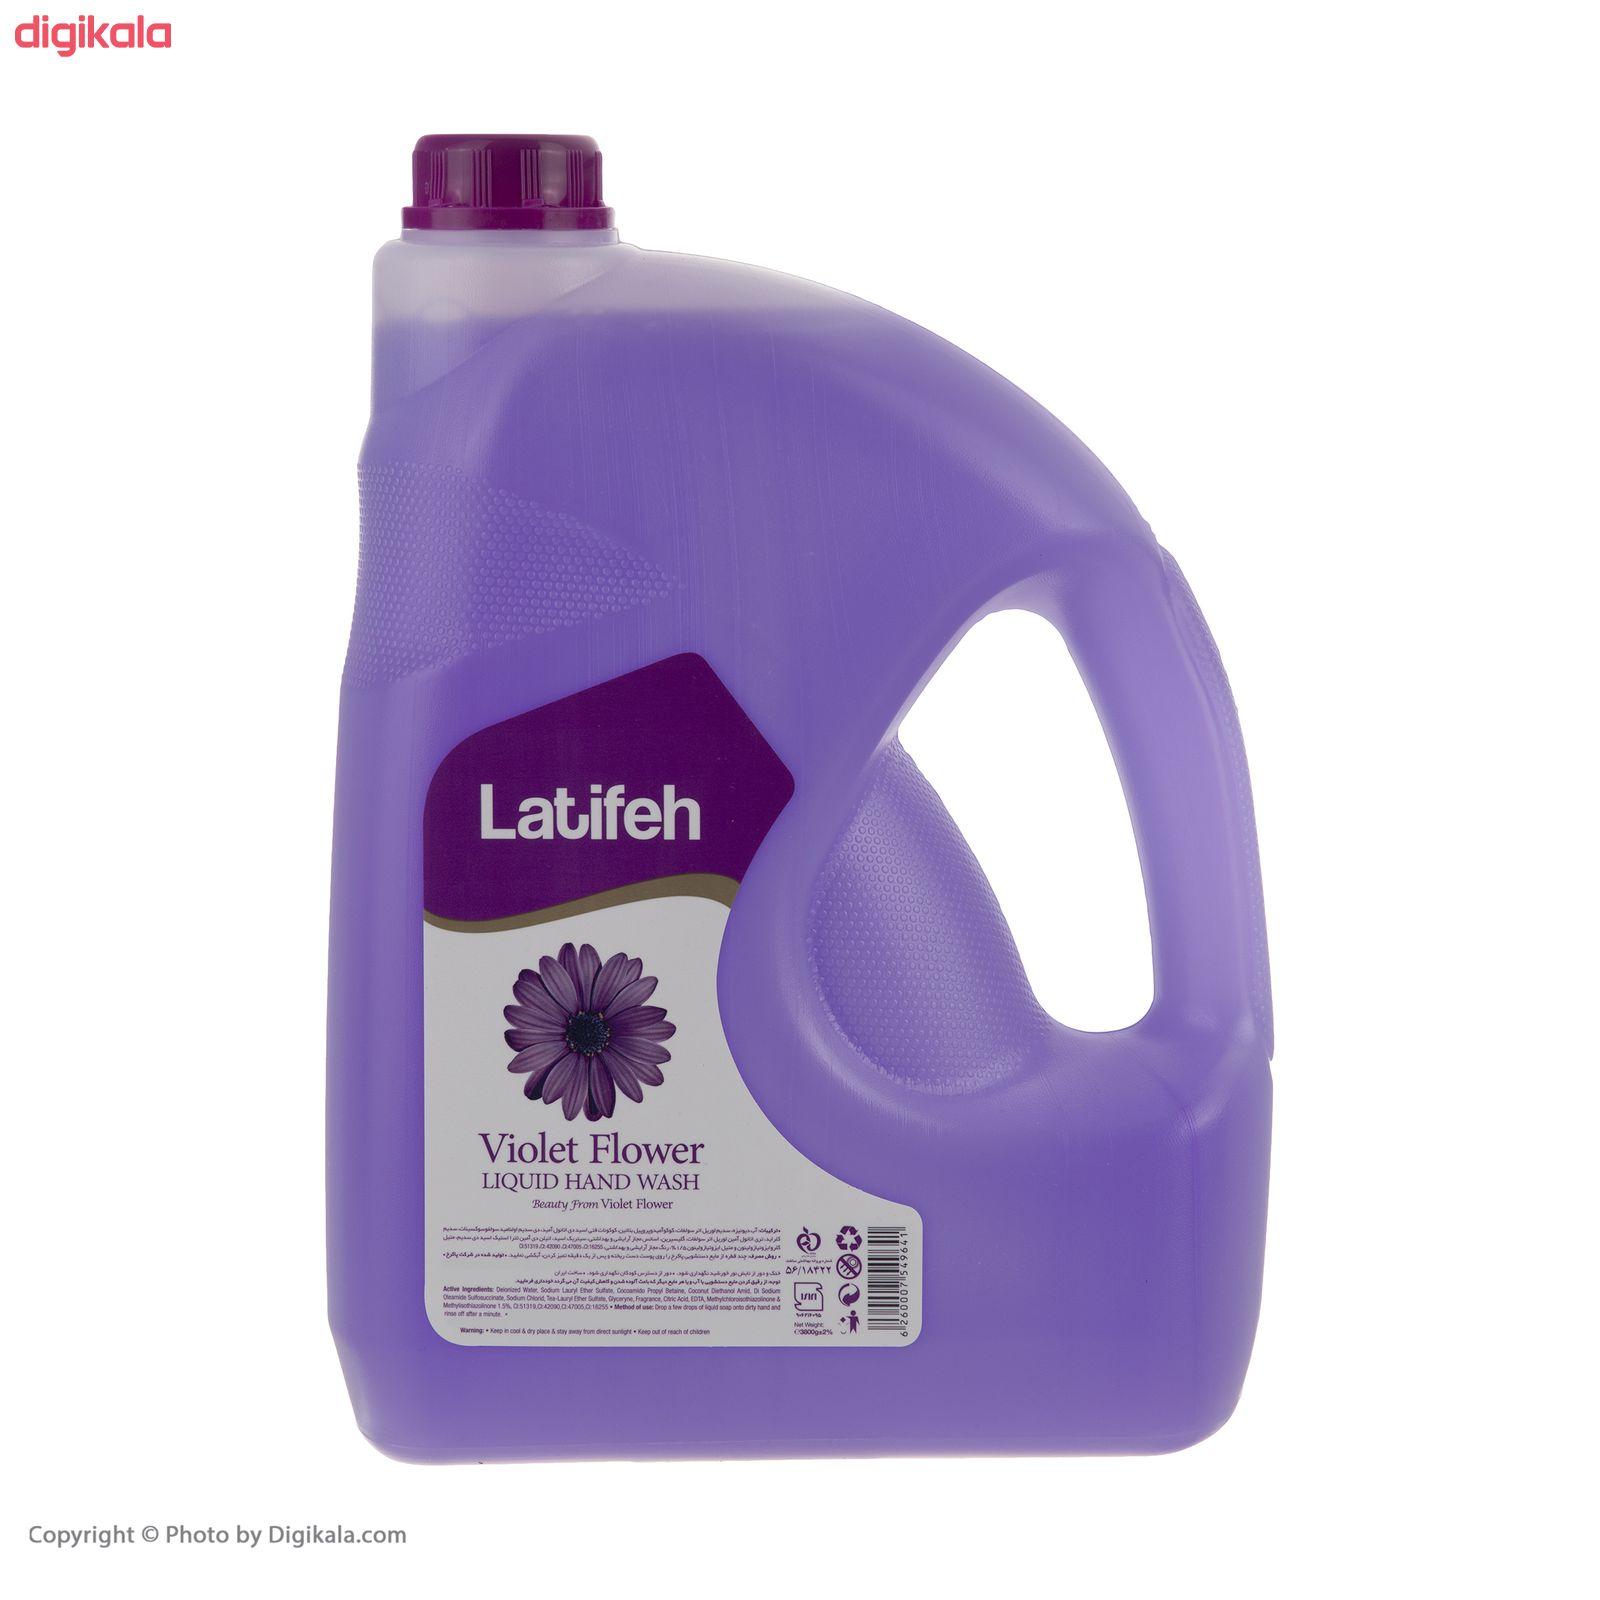 مایع دستشویی لطیفه مدل  Violet Flower وزن 3.8 کیلوگرم main 1 1